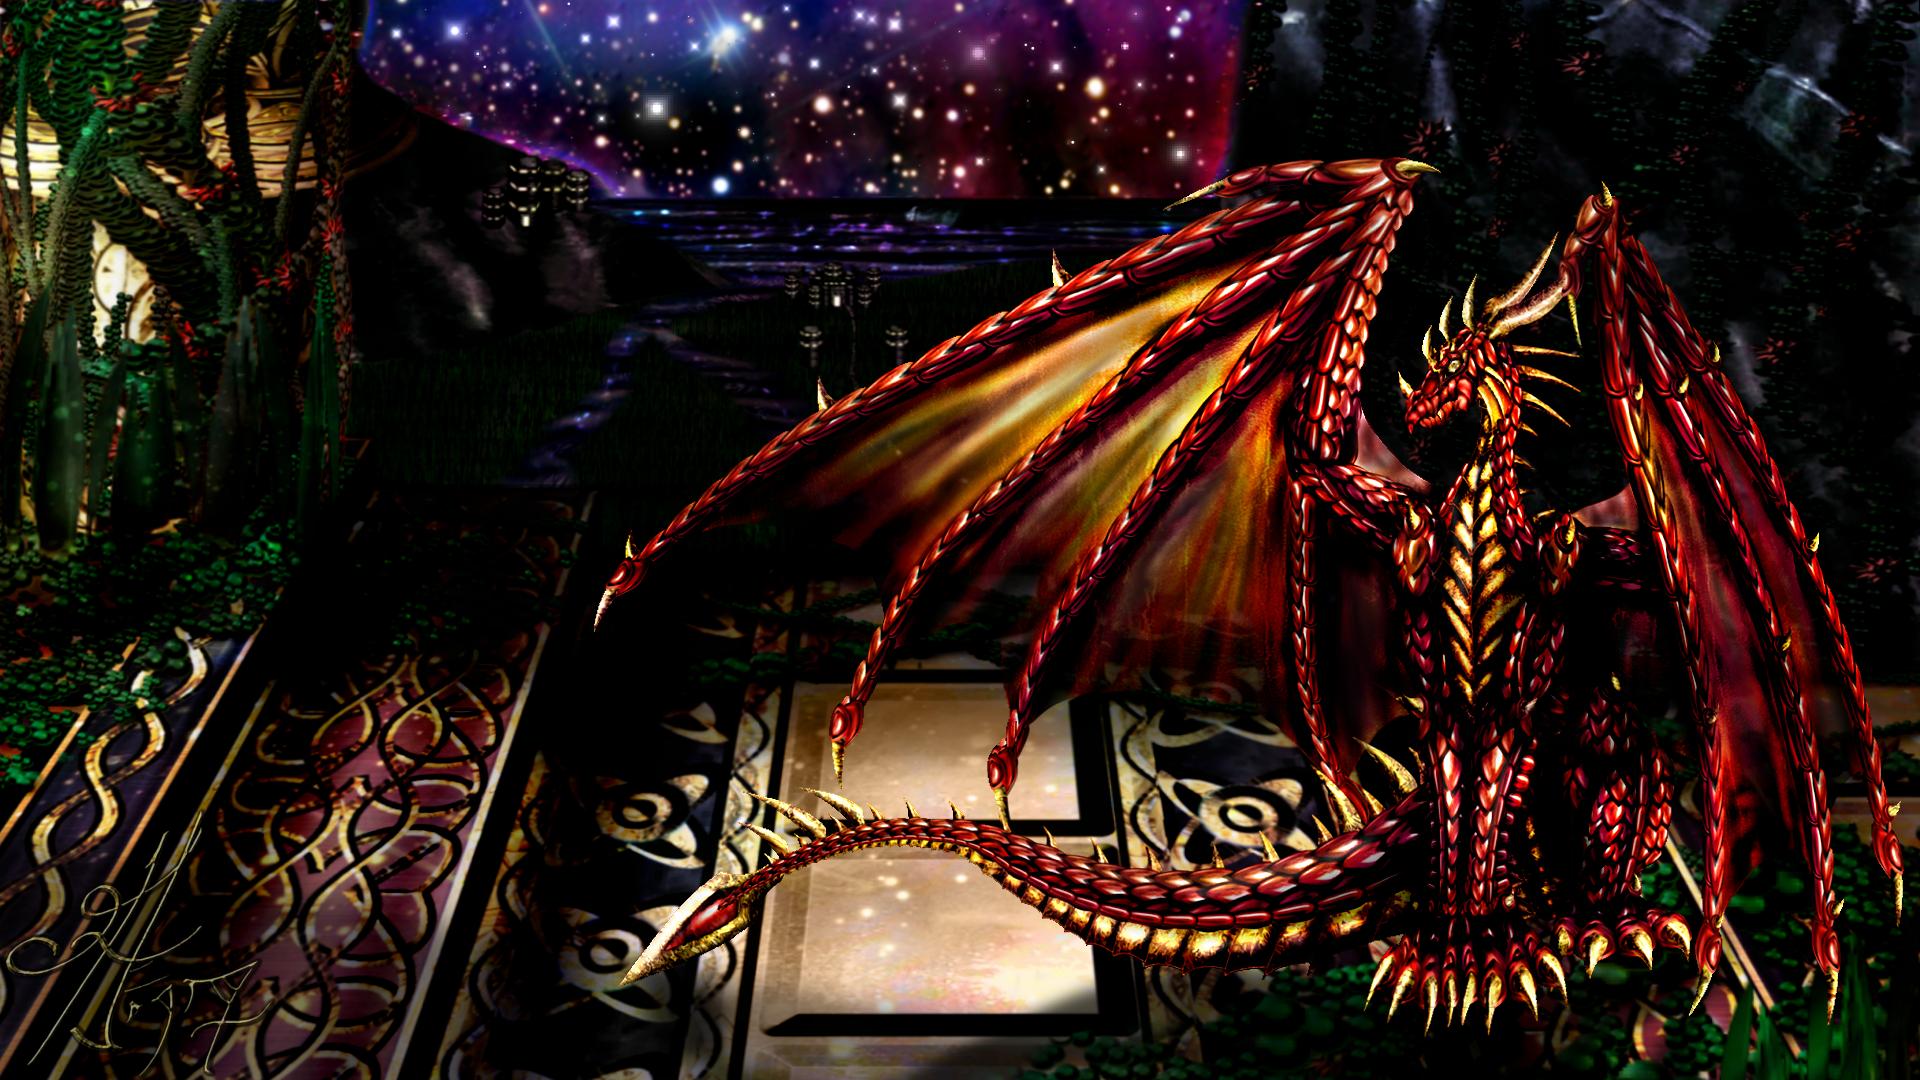 Red Drake's Nighttime Watch by Ahakarin